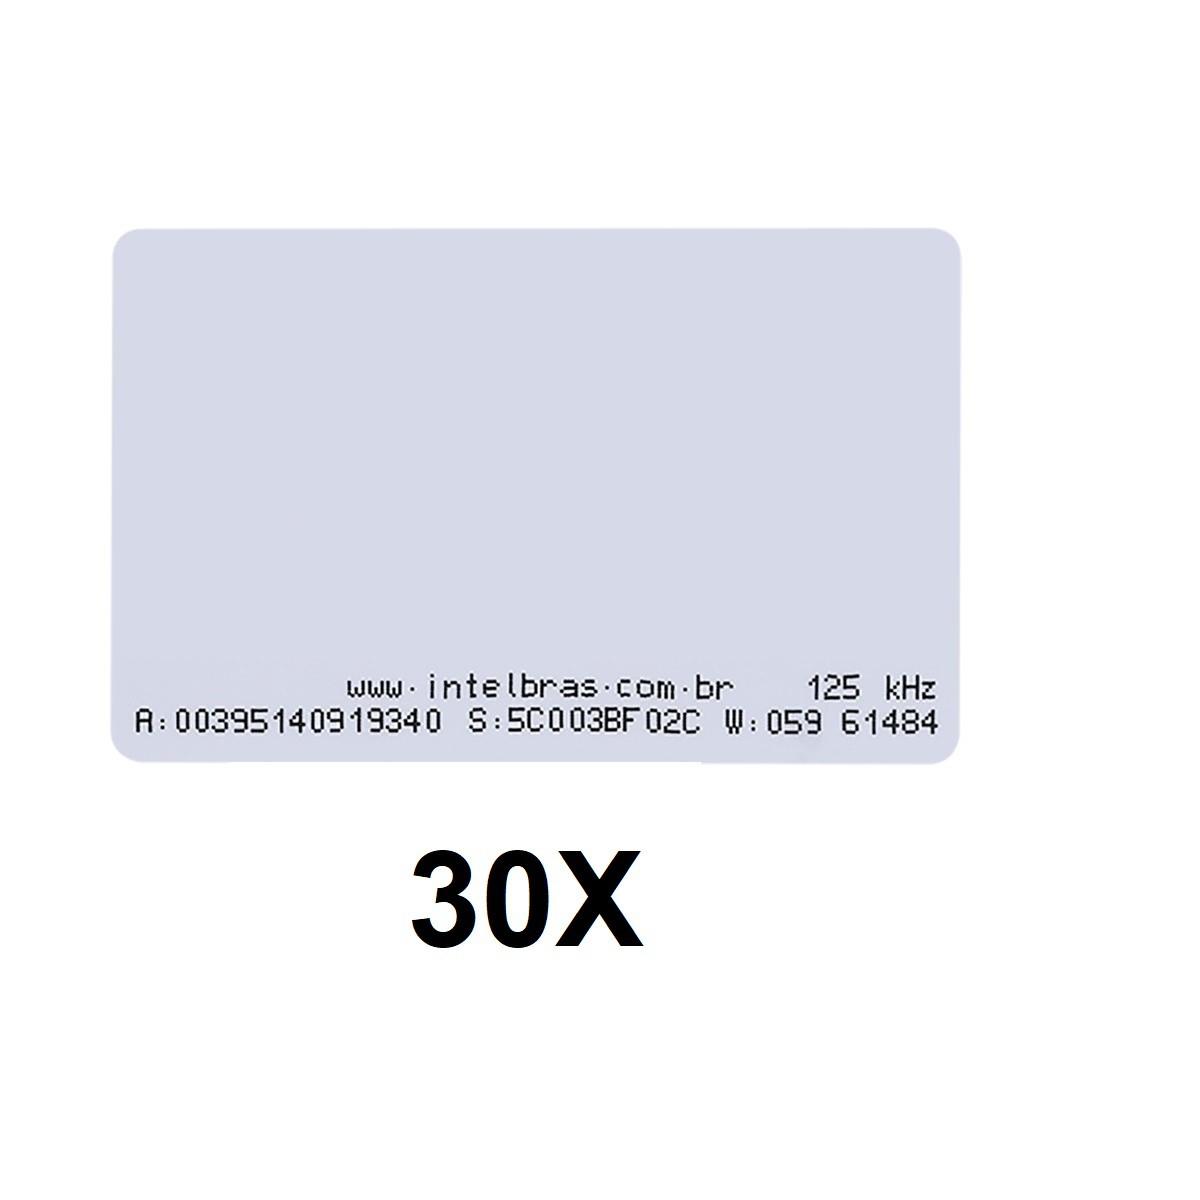 Kit 30 Cartões de Proximidade RFID 125 kHz Intelbras TH 2000